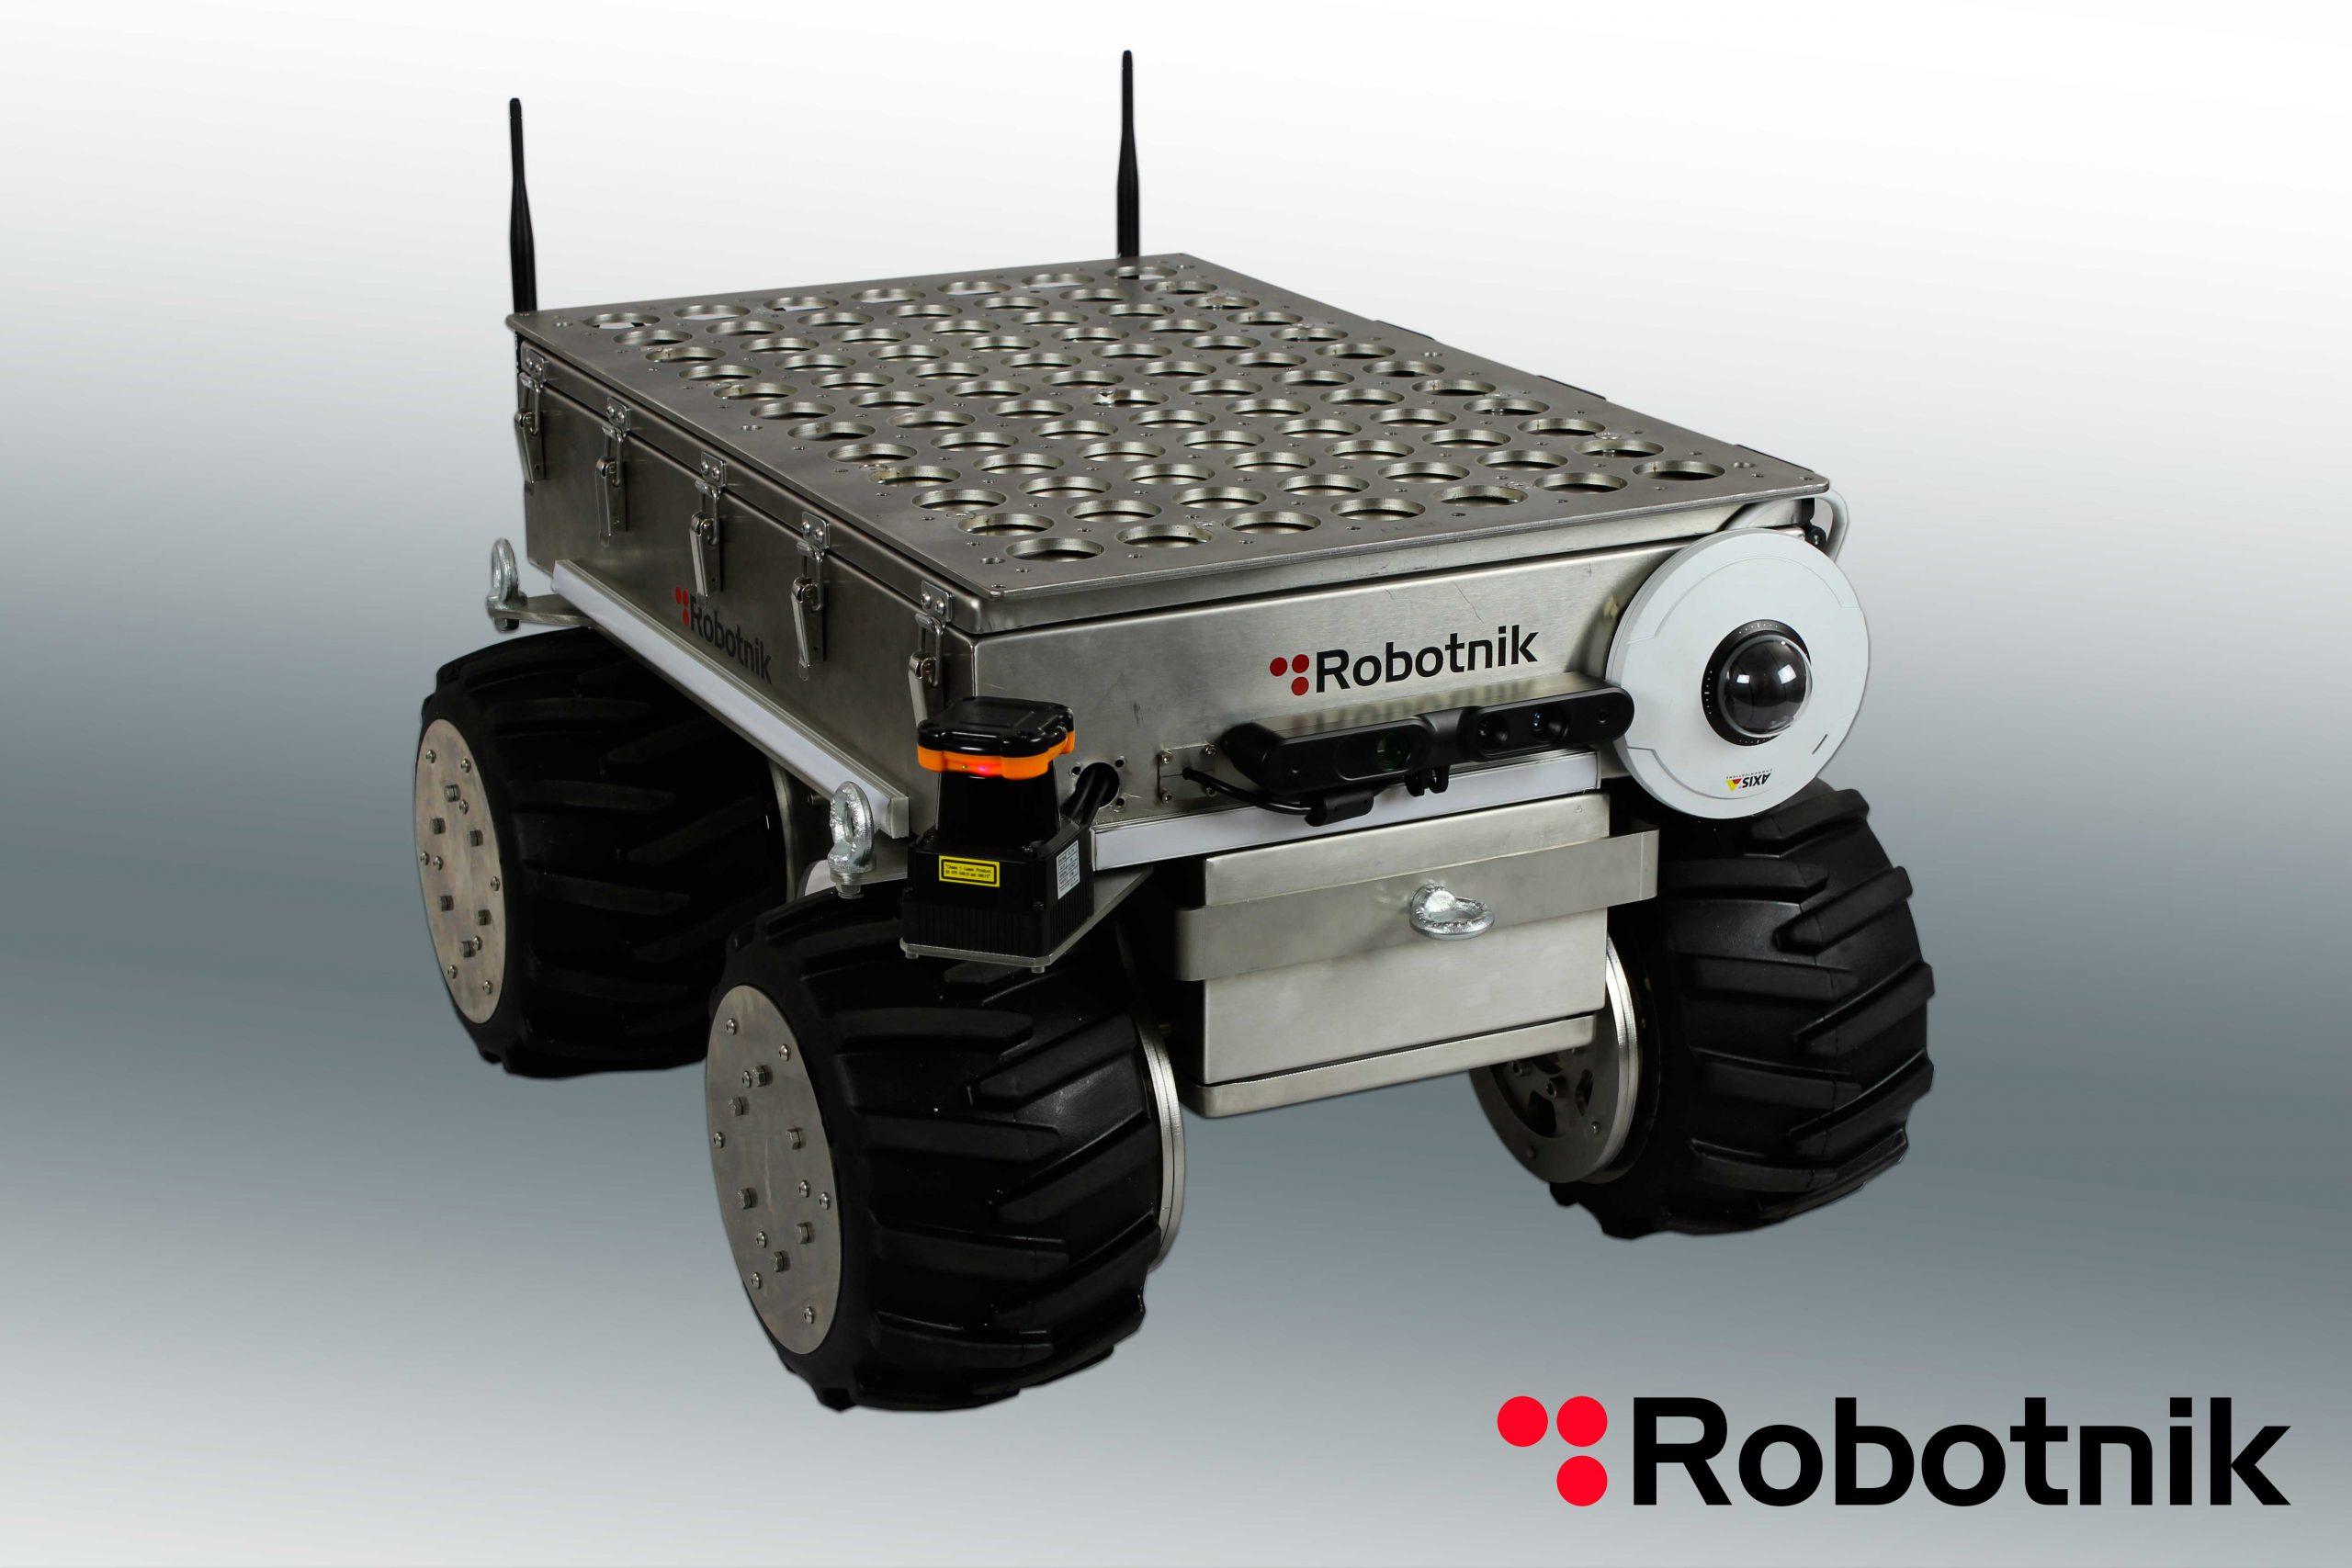 Robotnik_Summit_XL_Steel_02